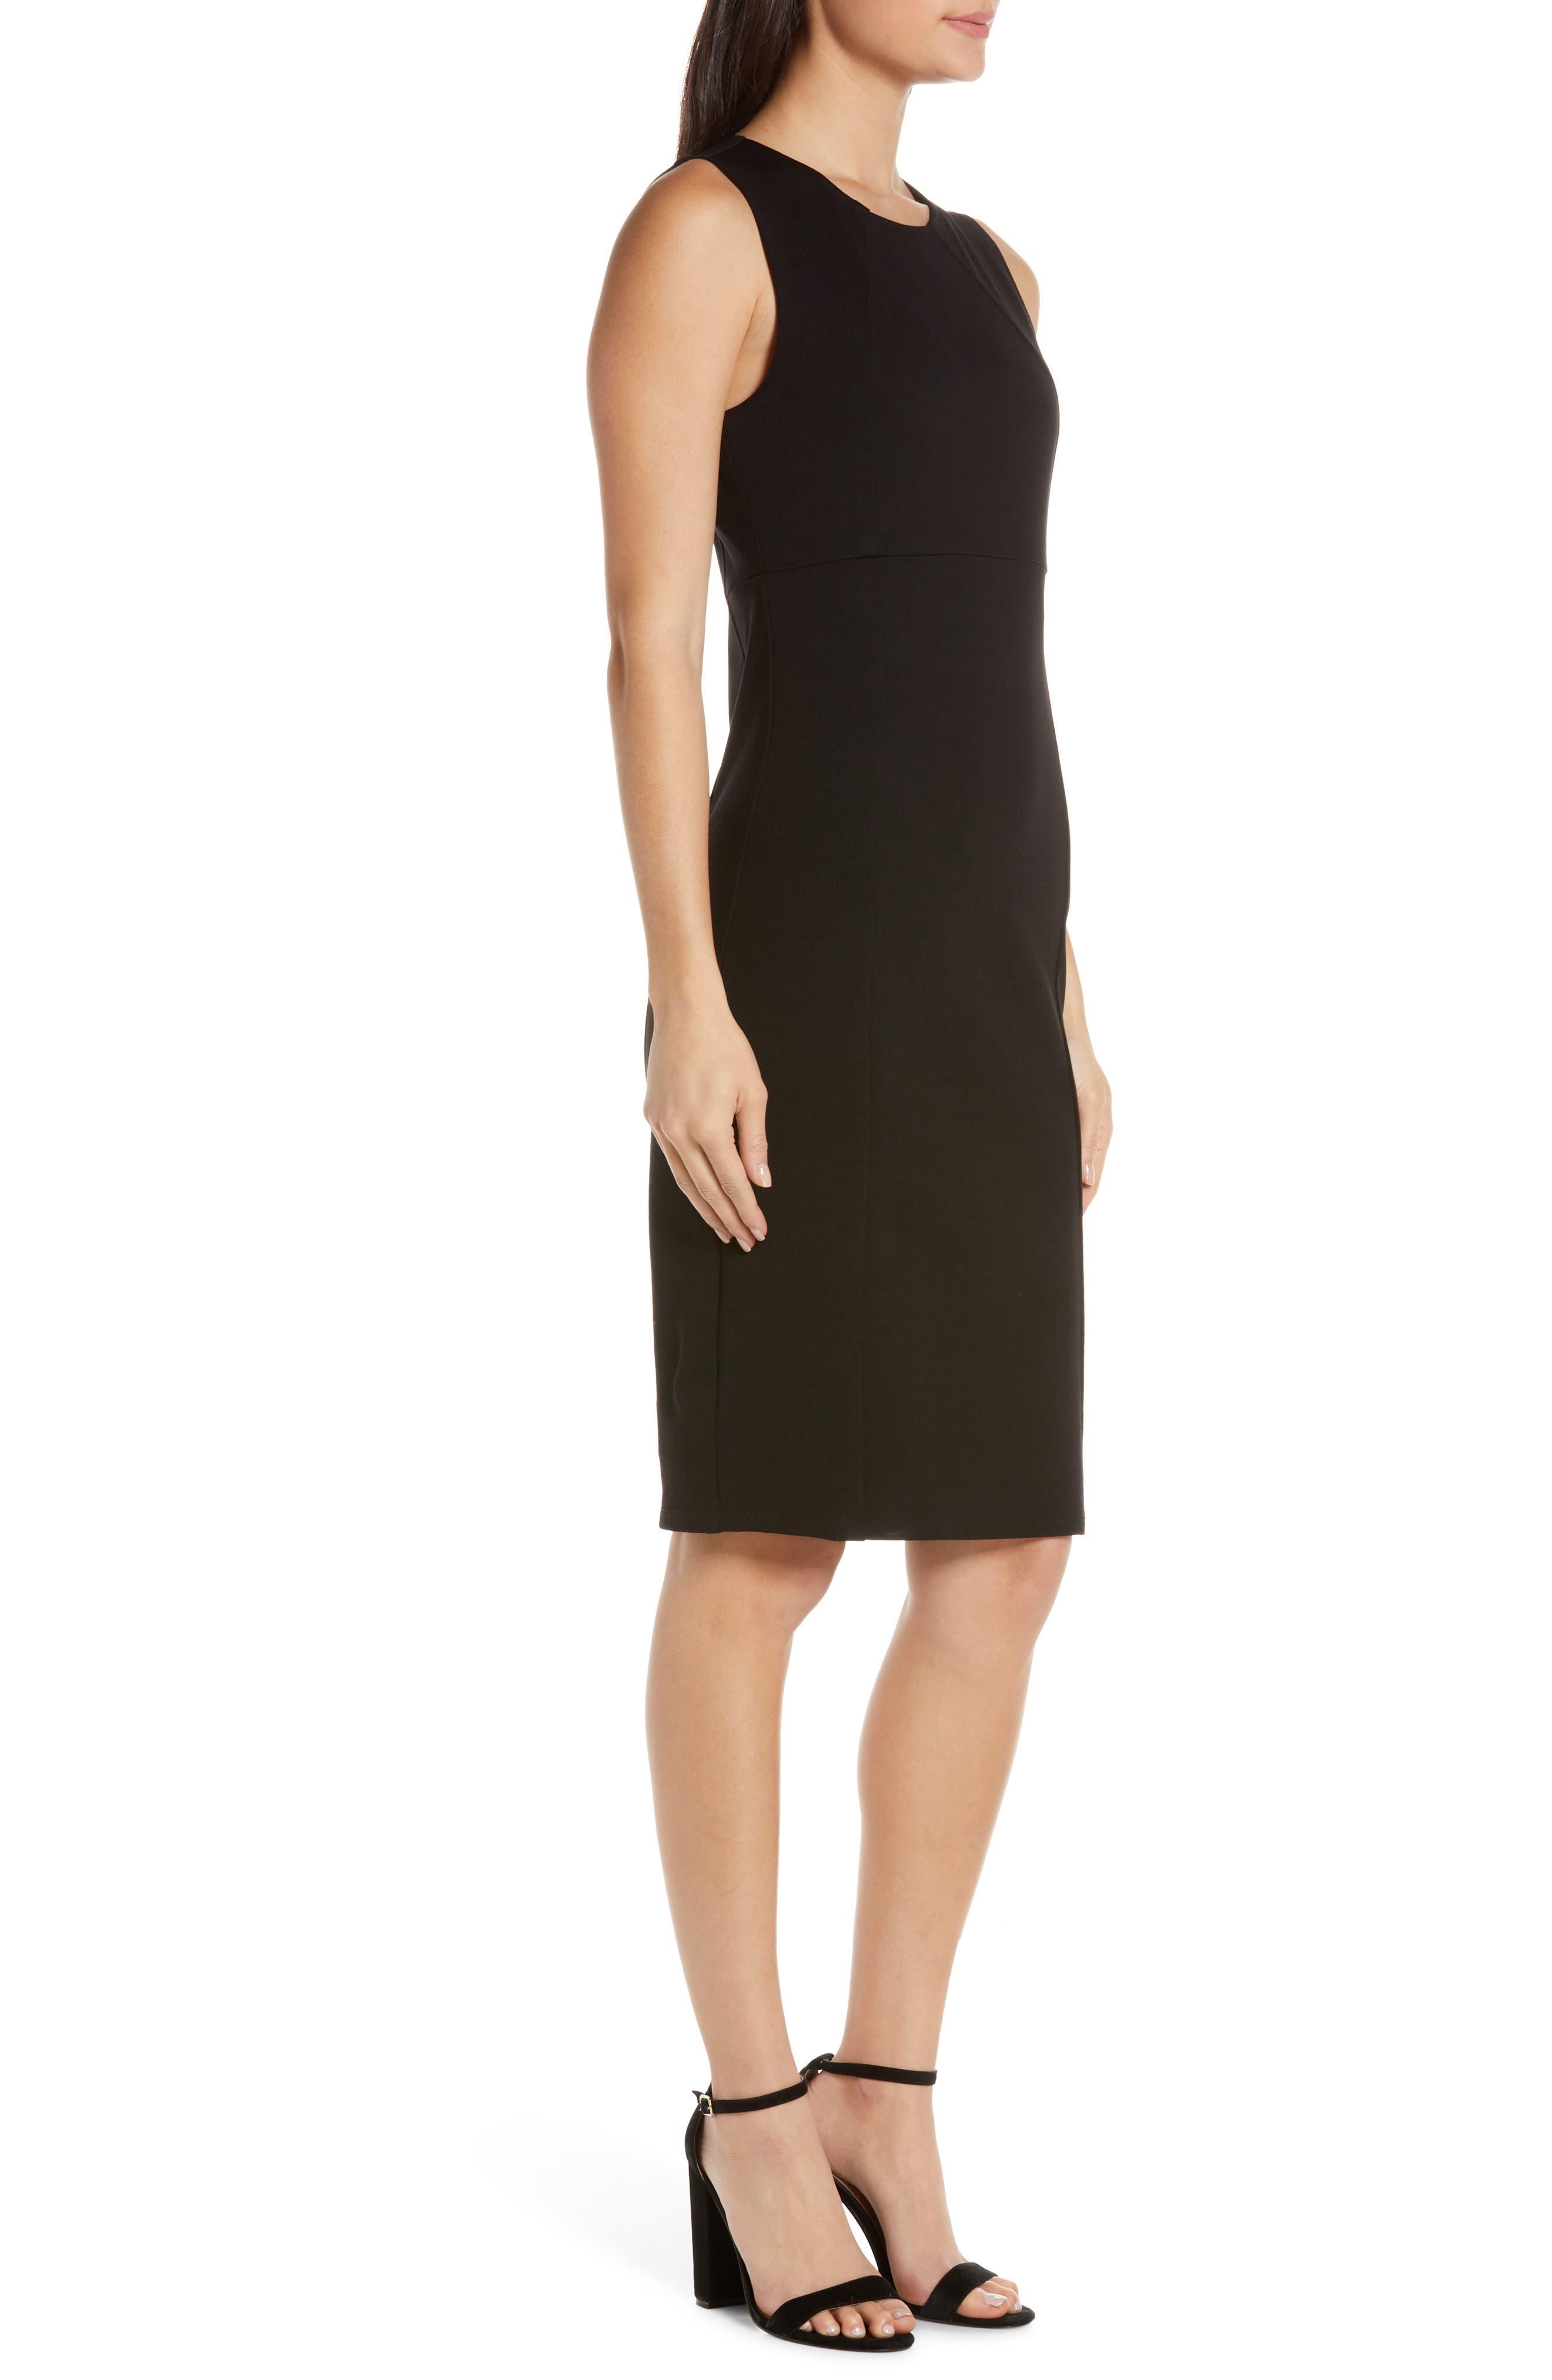 CHARLES HENRY, Sleeveless Sheath Dress, Alternate thumbnail 4, color, BLACK